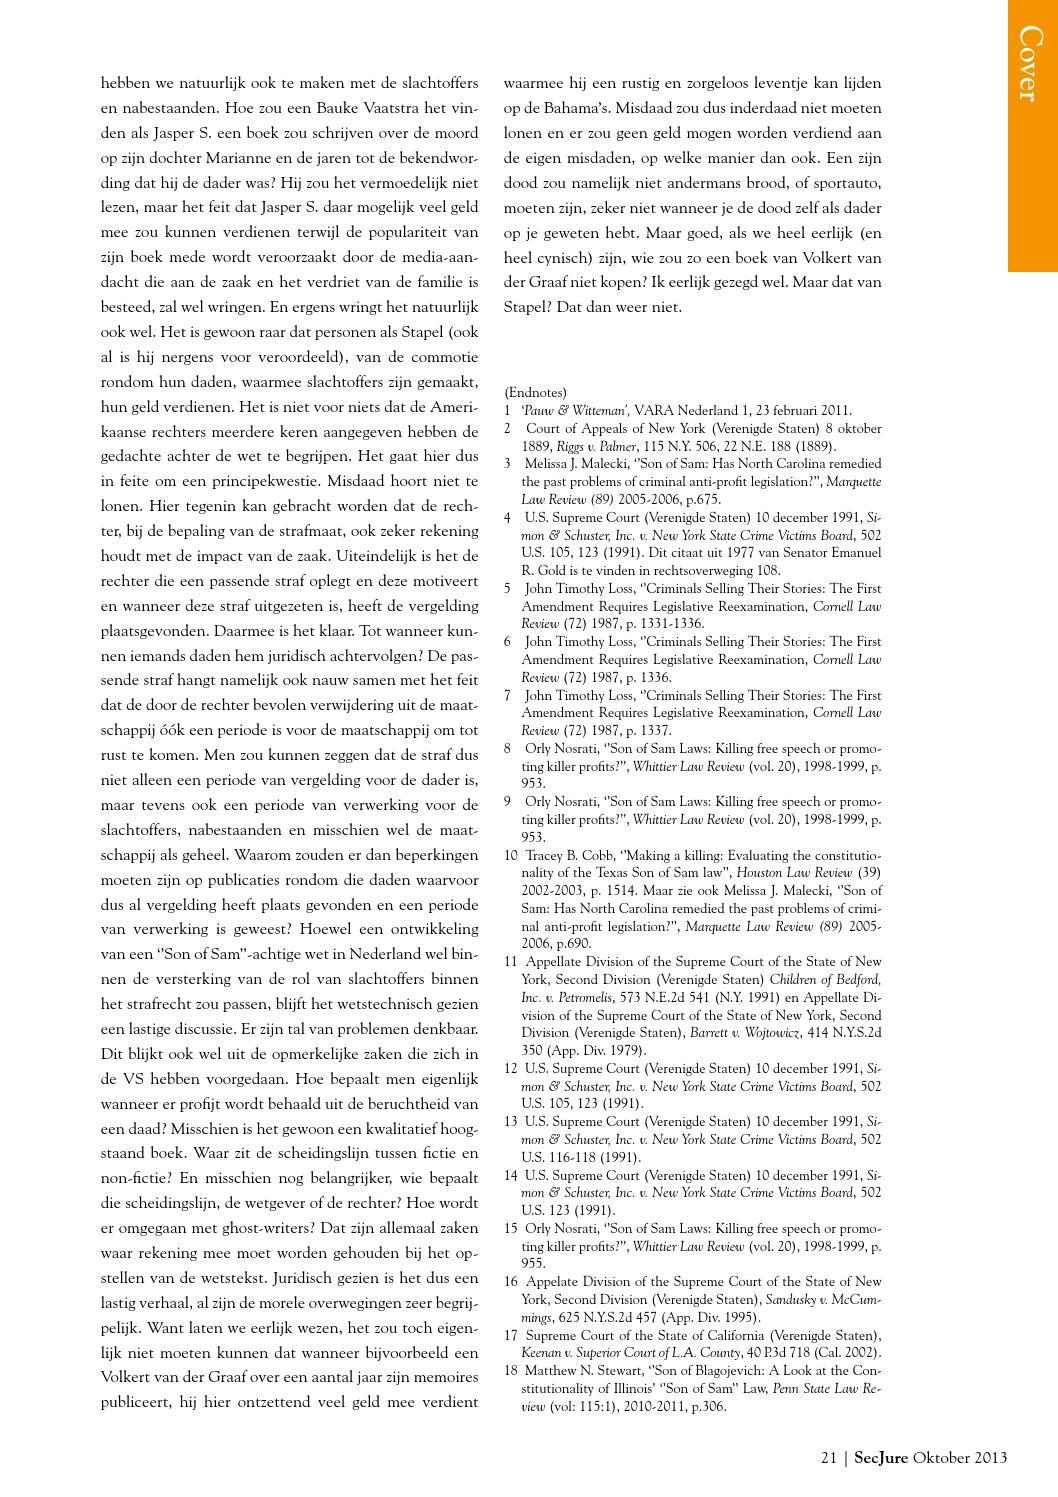 riggs v palmer 115 ny 506 pdf